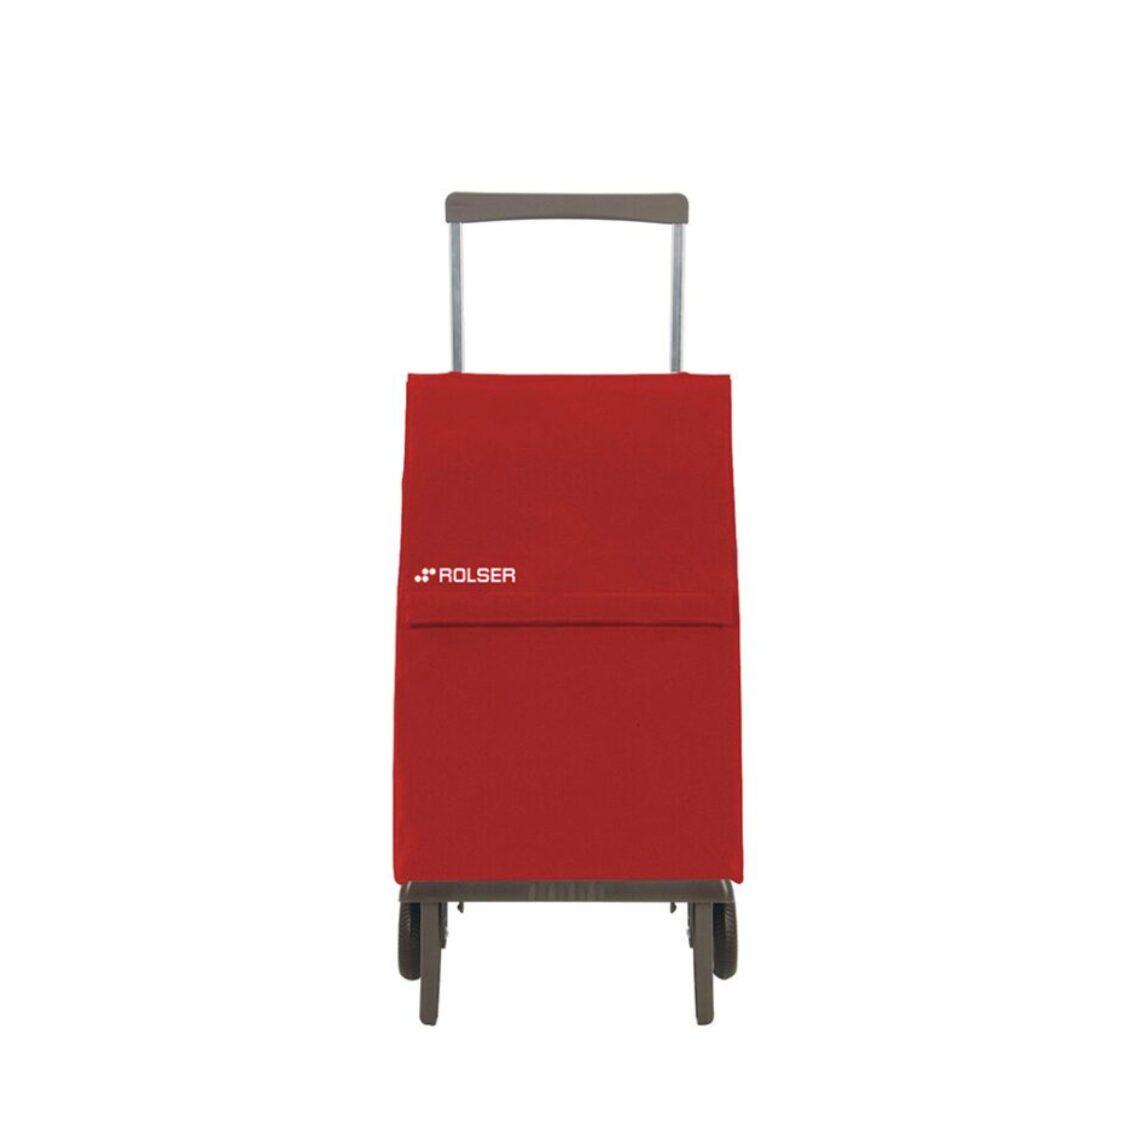 Rolser Plegamatic Rojo Red J40117